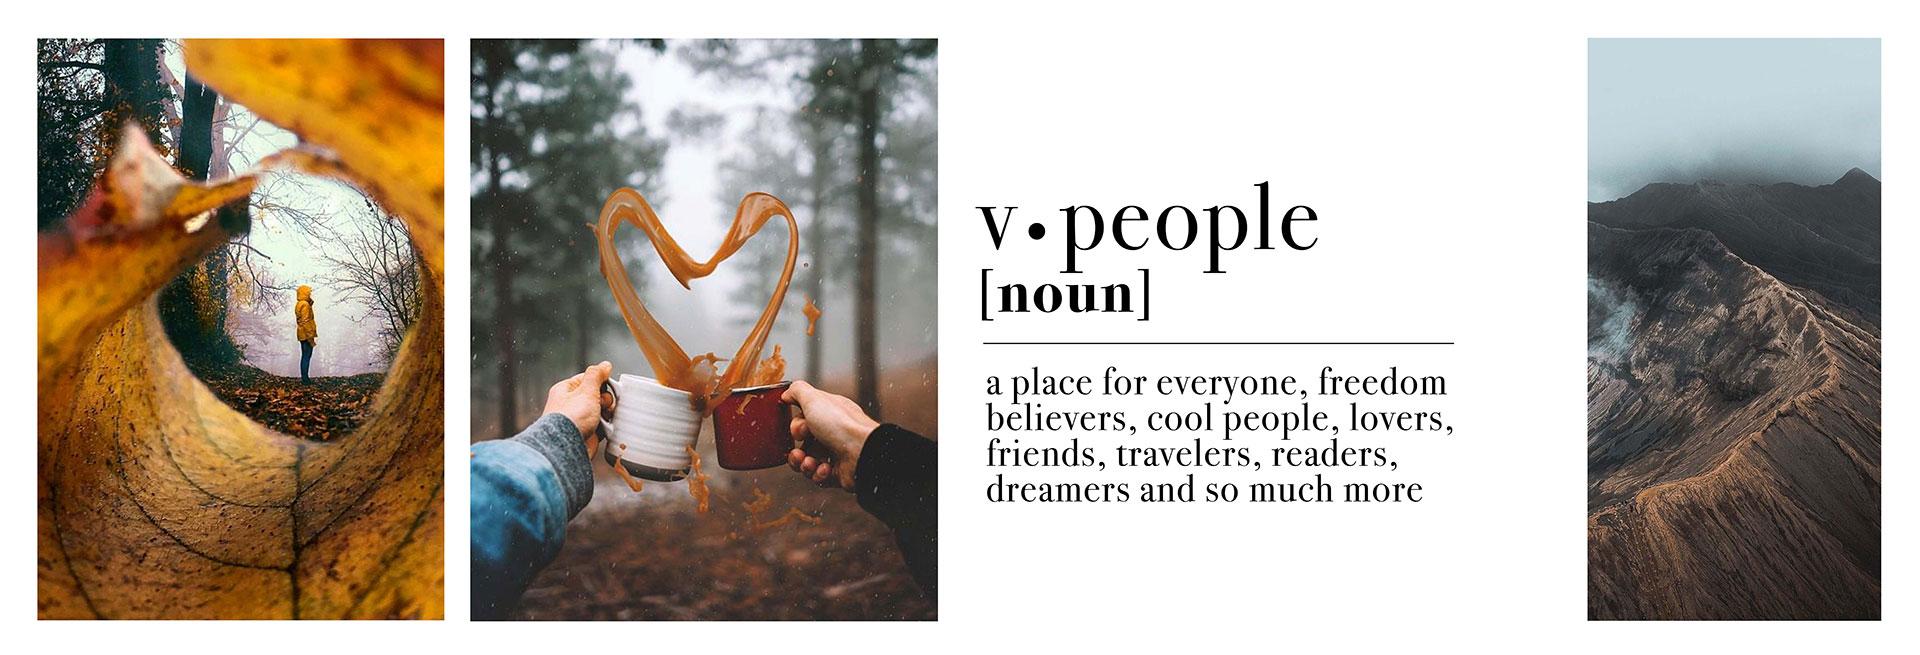 v-people-noun